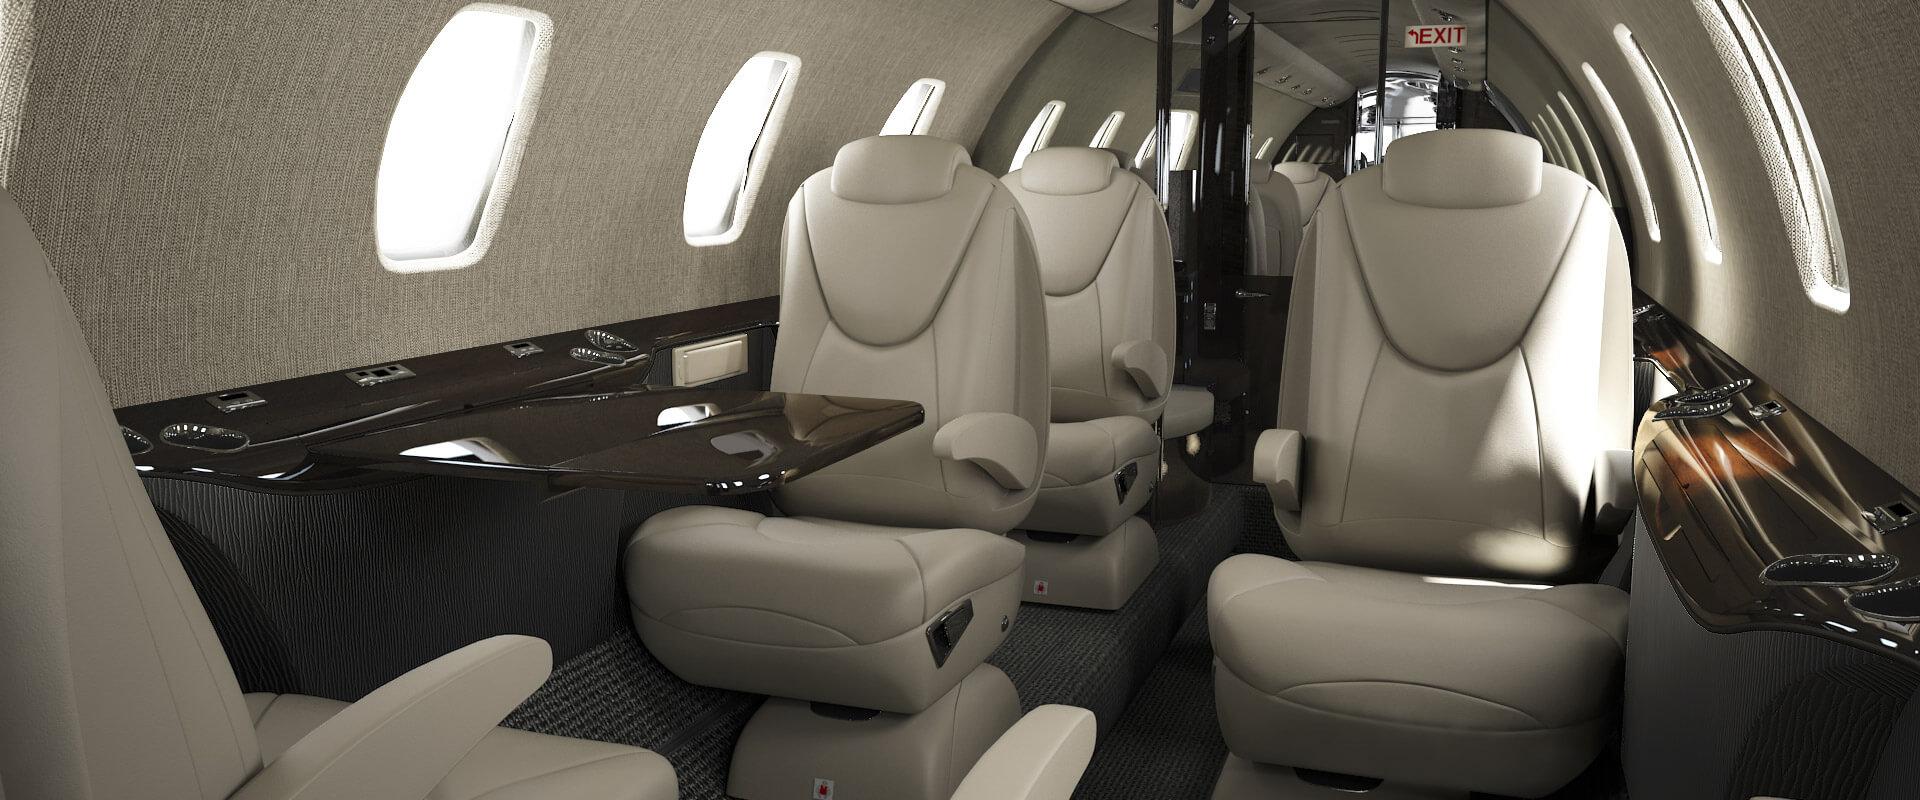 Textron Aviation | Manufacturer of Beechcraft and Cessna